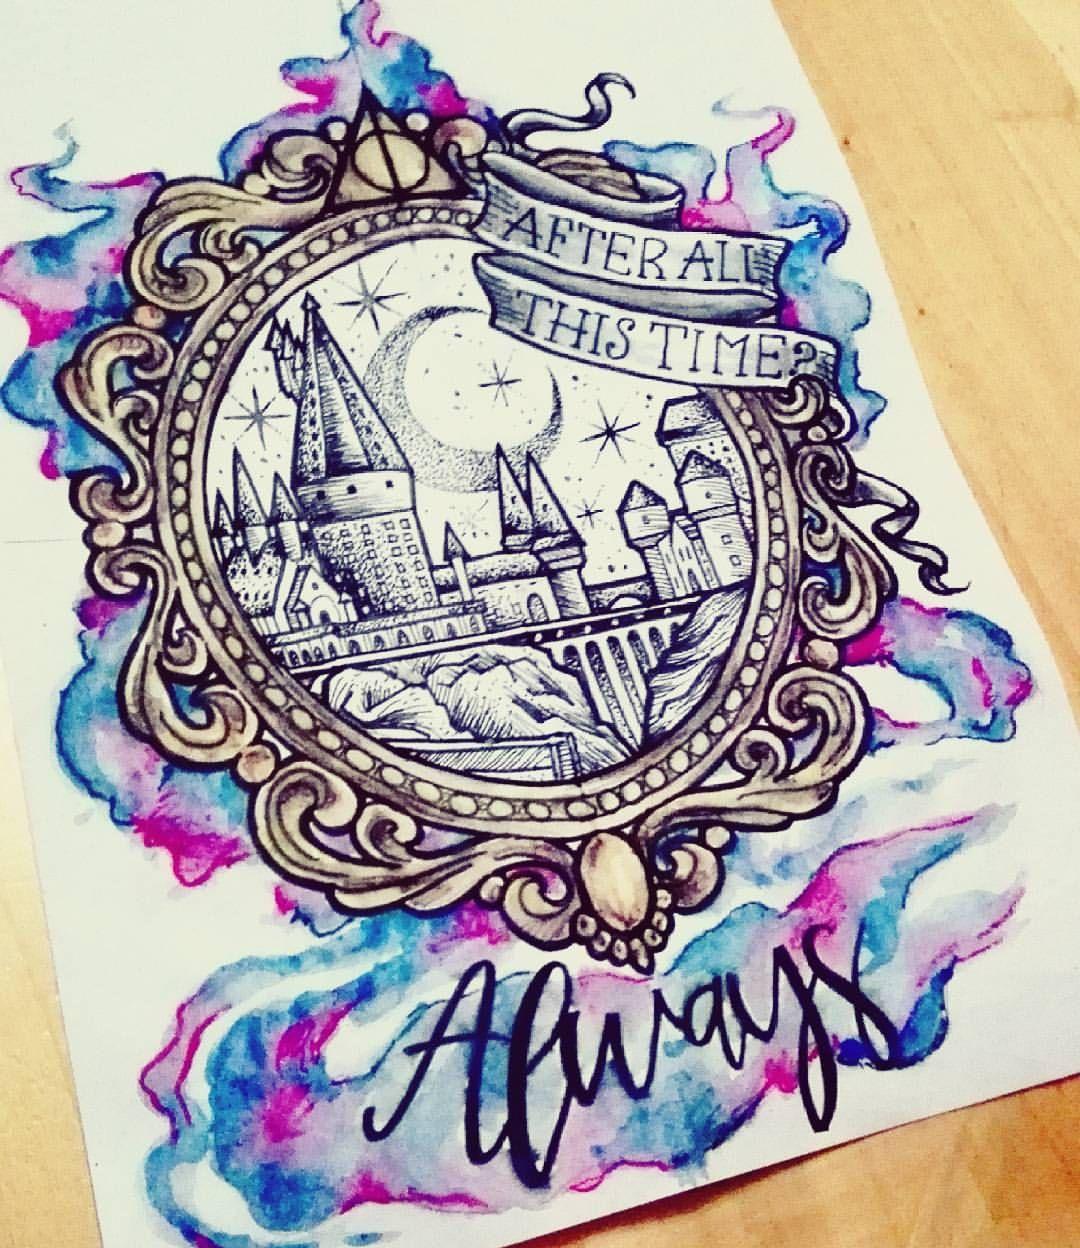 35 Likes 5 Comments Lara Babz Tattoo Larababztattoo On Instagram Harrypotter Harrypotterf Harry Potter Tattoos Harry Potter Drawings Harry Potter Art